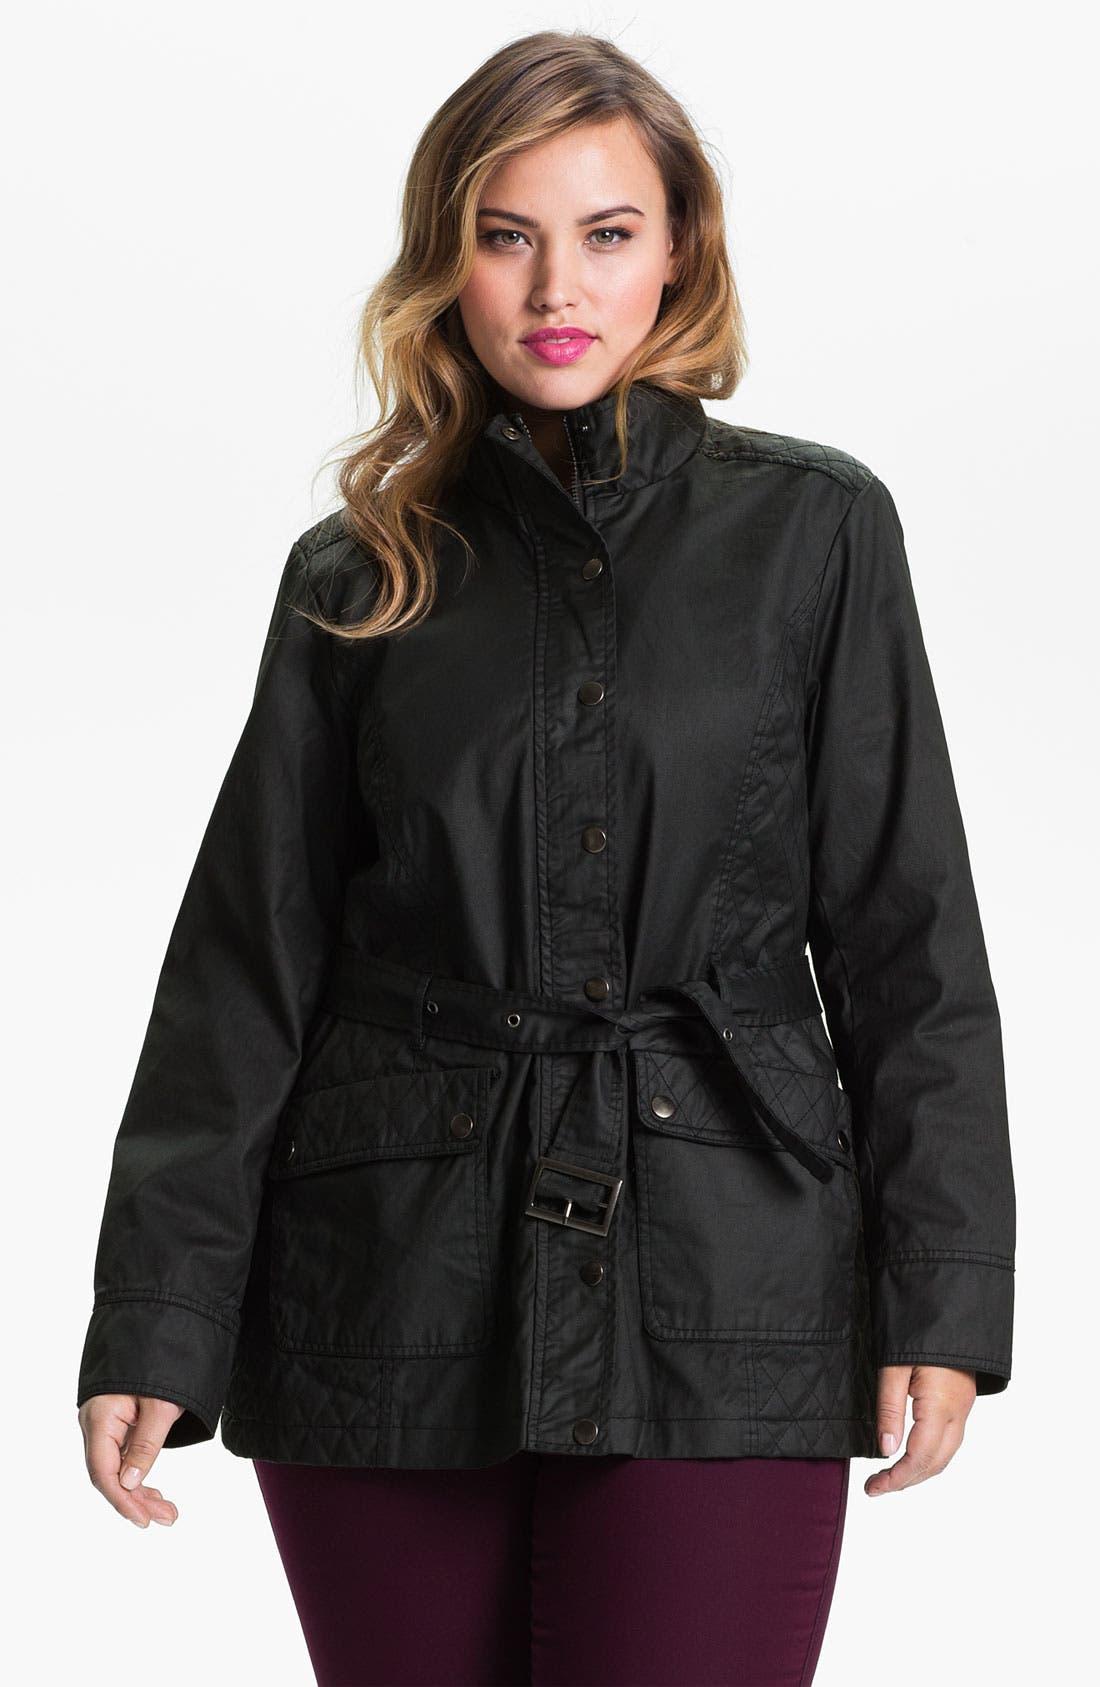 Alternate Image 1 Selected - Evans Waxed Cotton Funnel Neck Jacket (Plus Size)